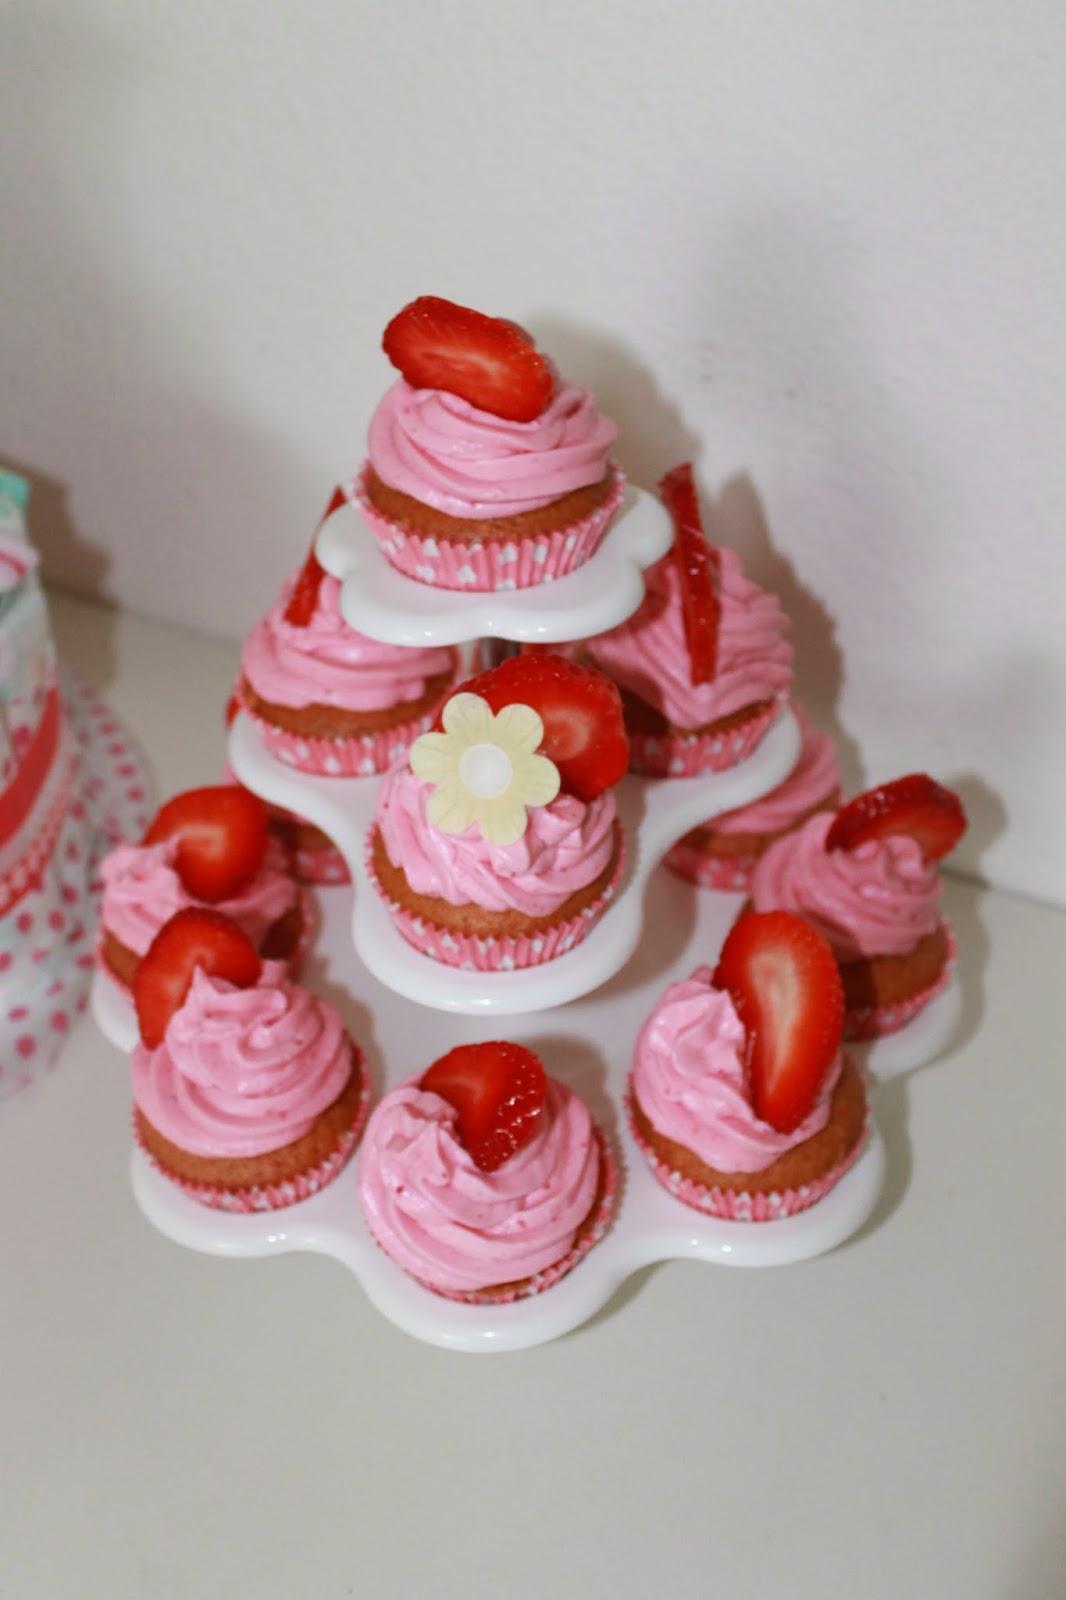 http://lieblingstorte.blogspot.de/p/erdbeer-cupcakes.html